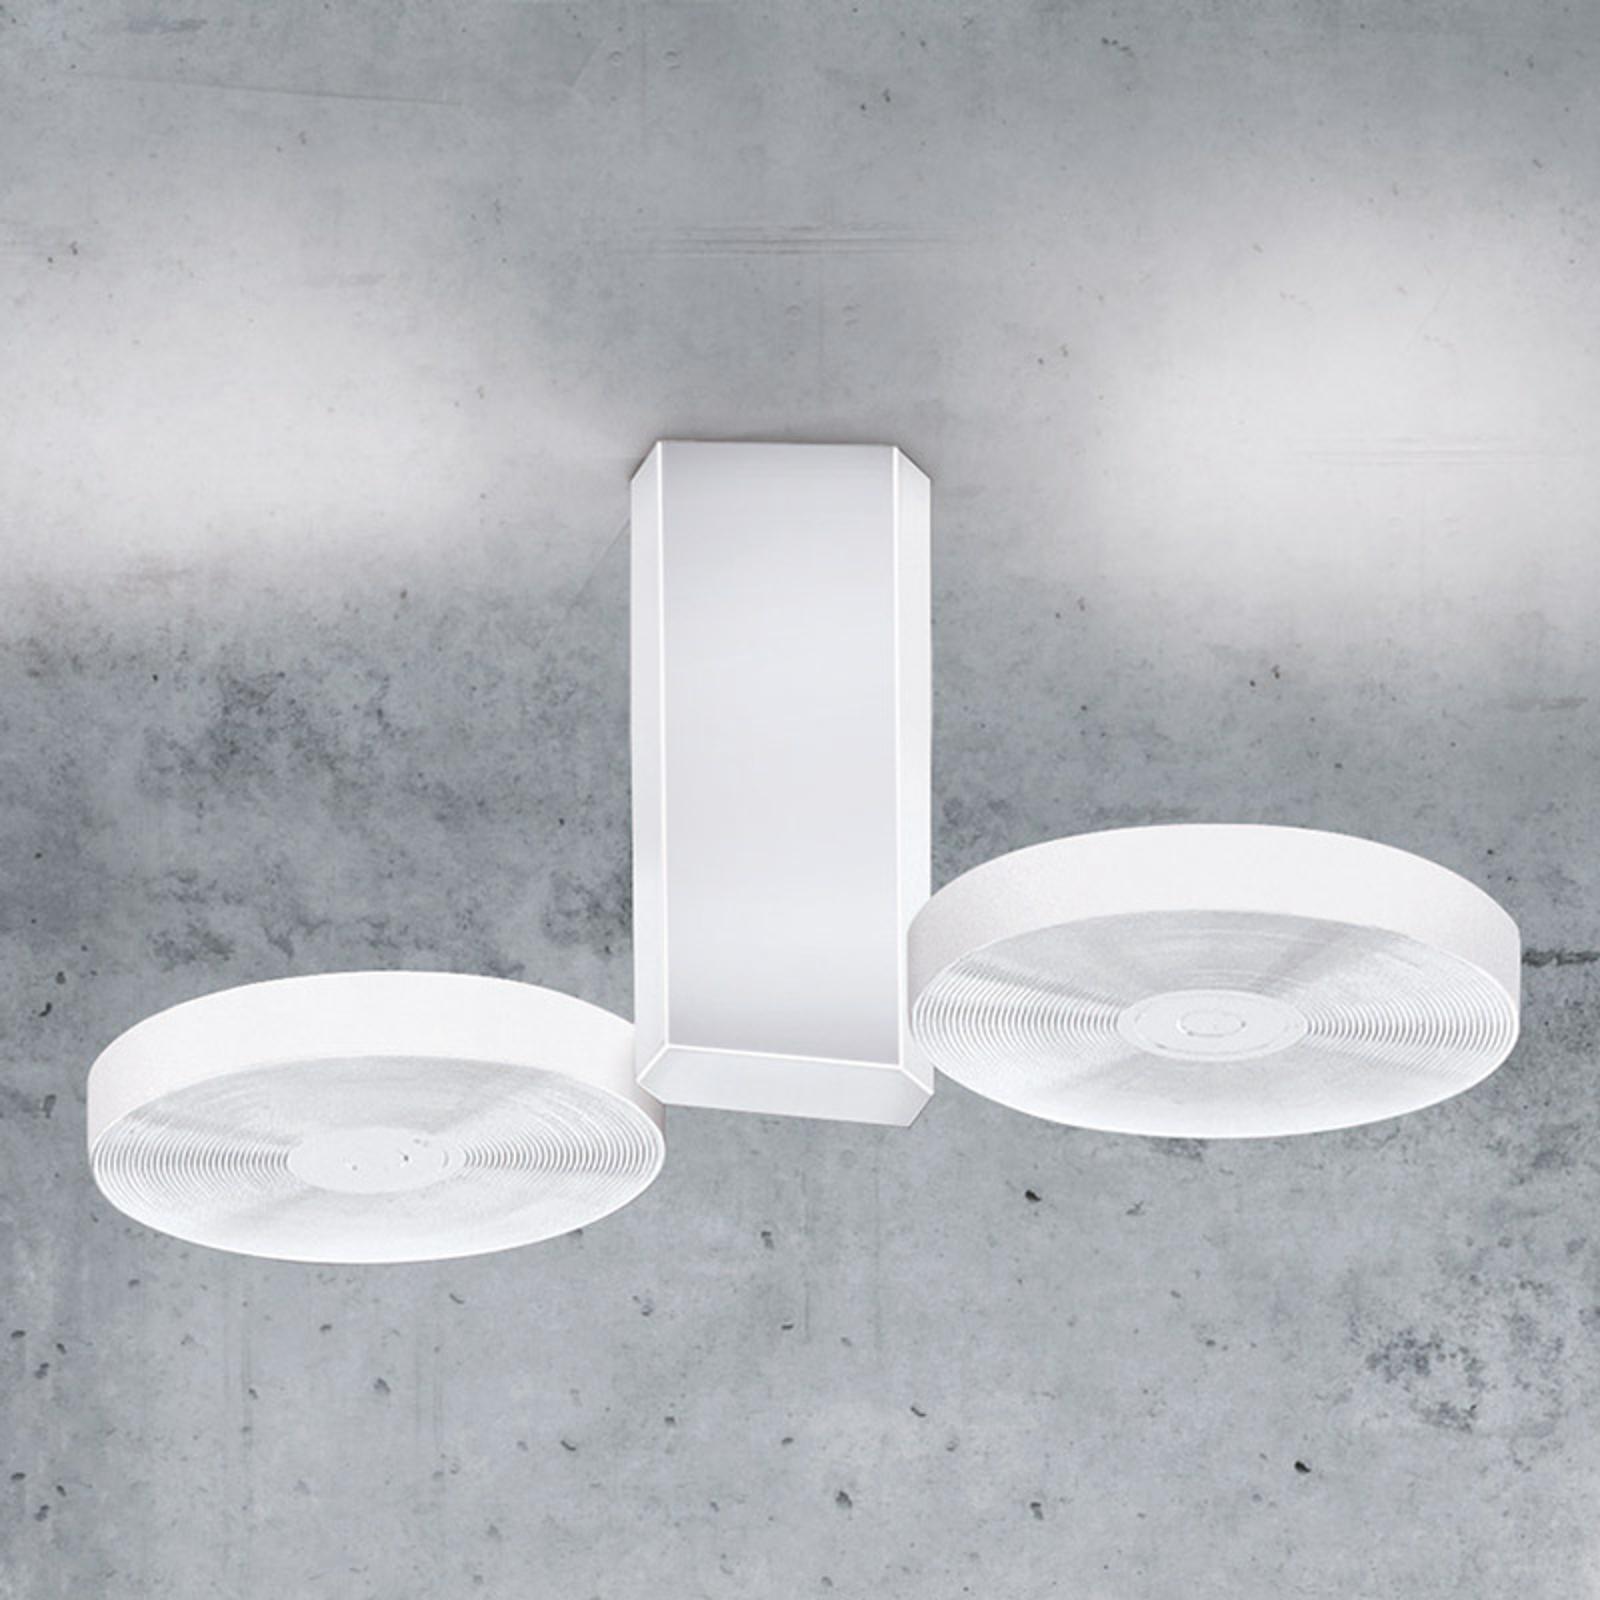 Lampa sufitowa LED CIDI, biała